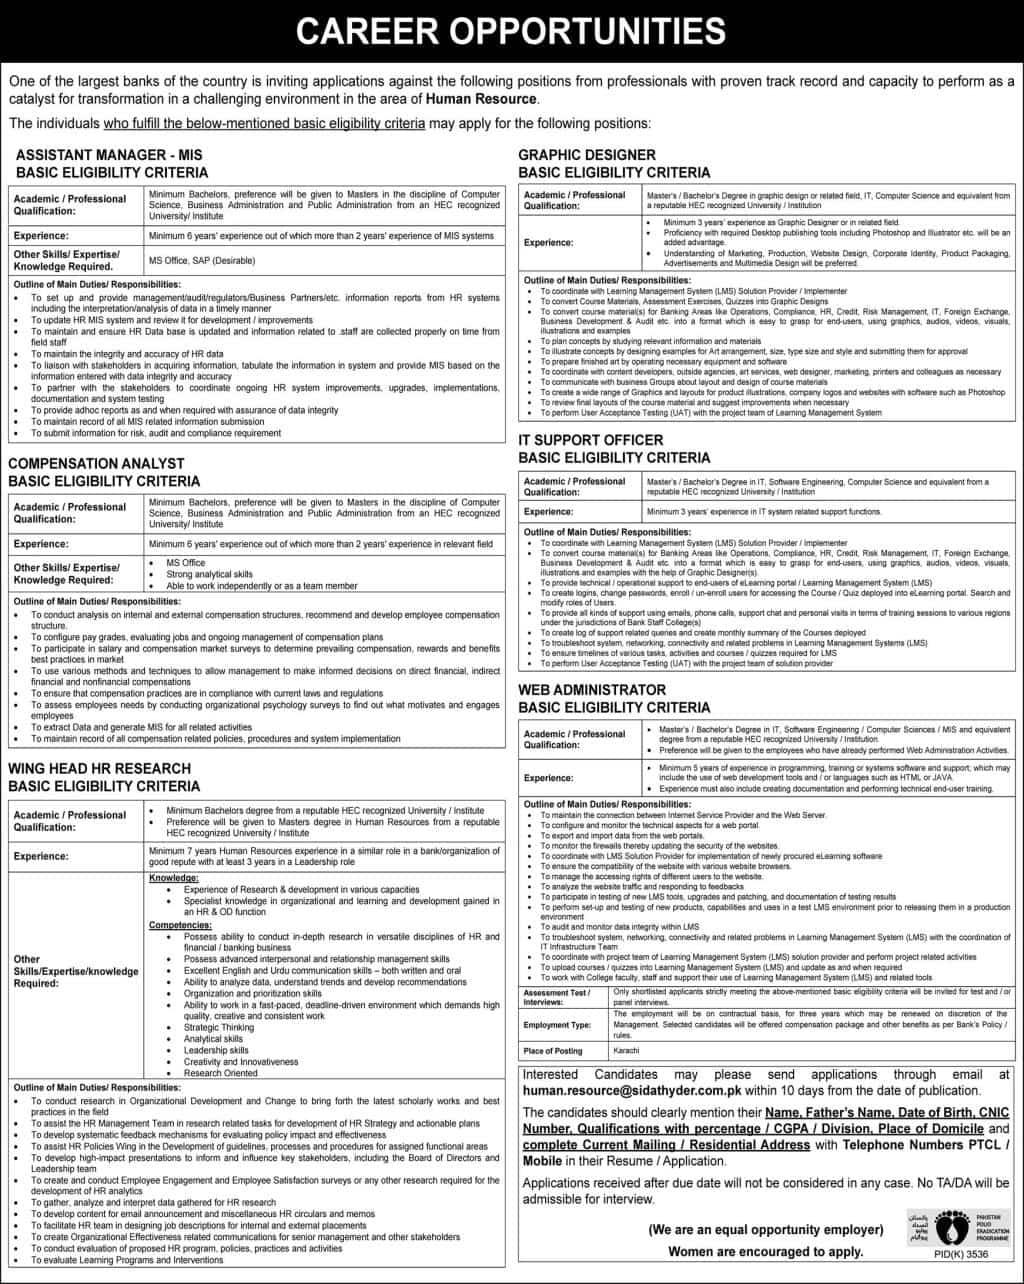 NBP Jobs 2020 April, Largest Commercial Bank of Pakistan